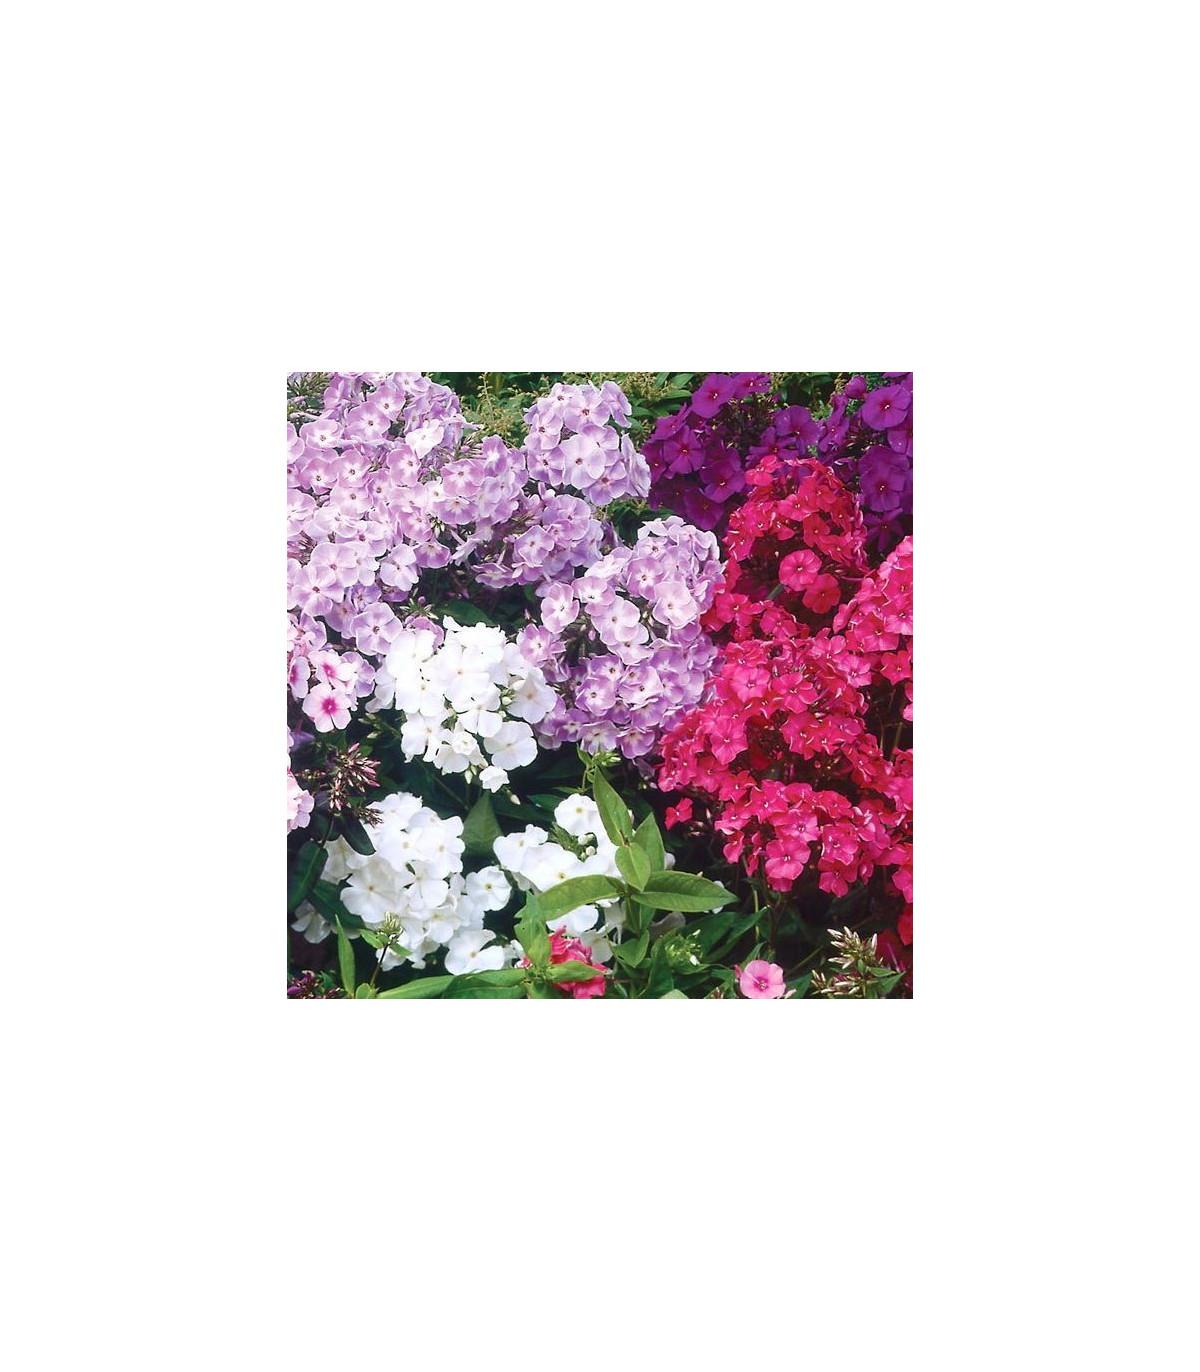 Plaménka latnatá - směs barev  - Phlox paniculata grandiflora - osivo plaménky - 15 ks